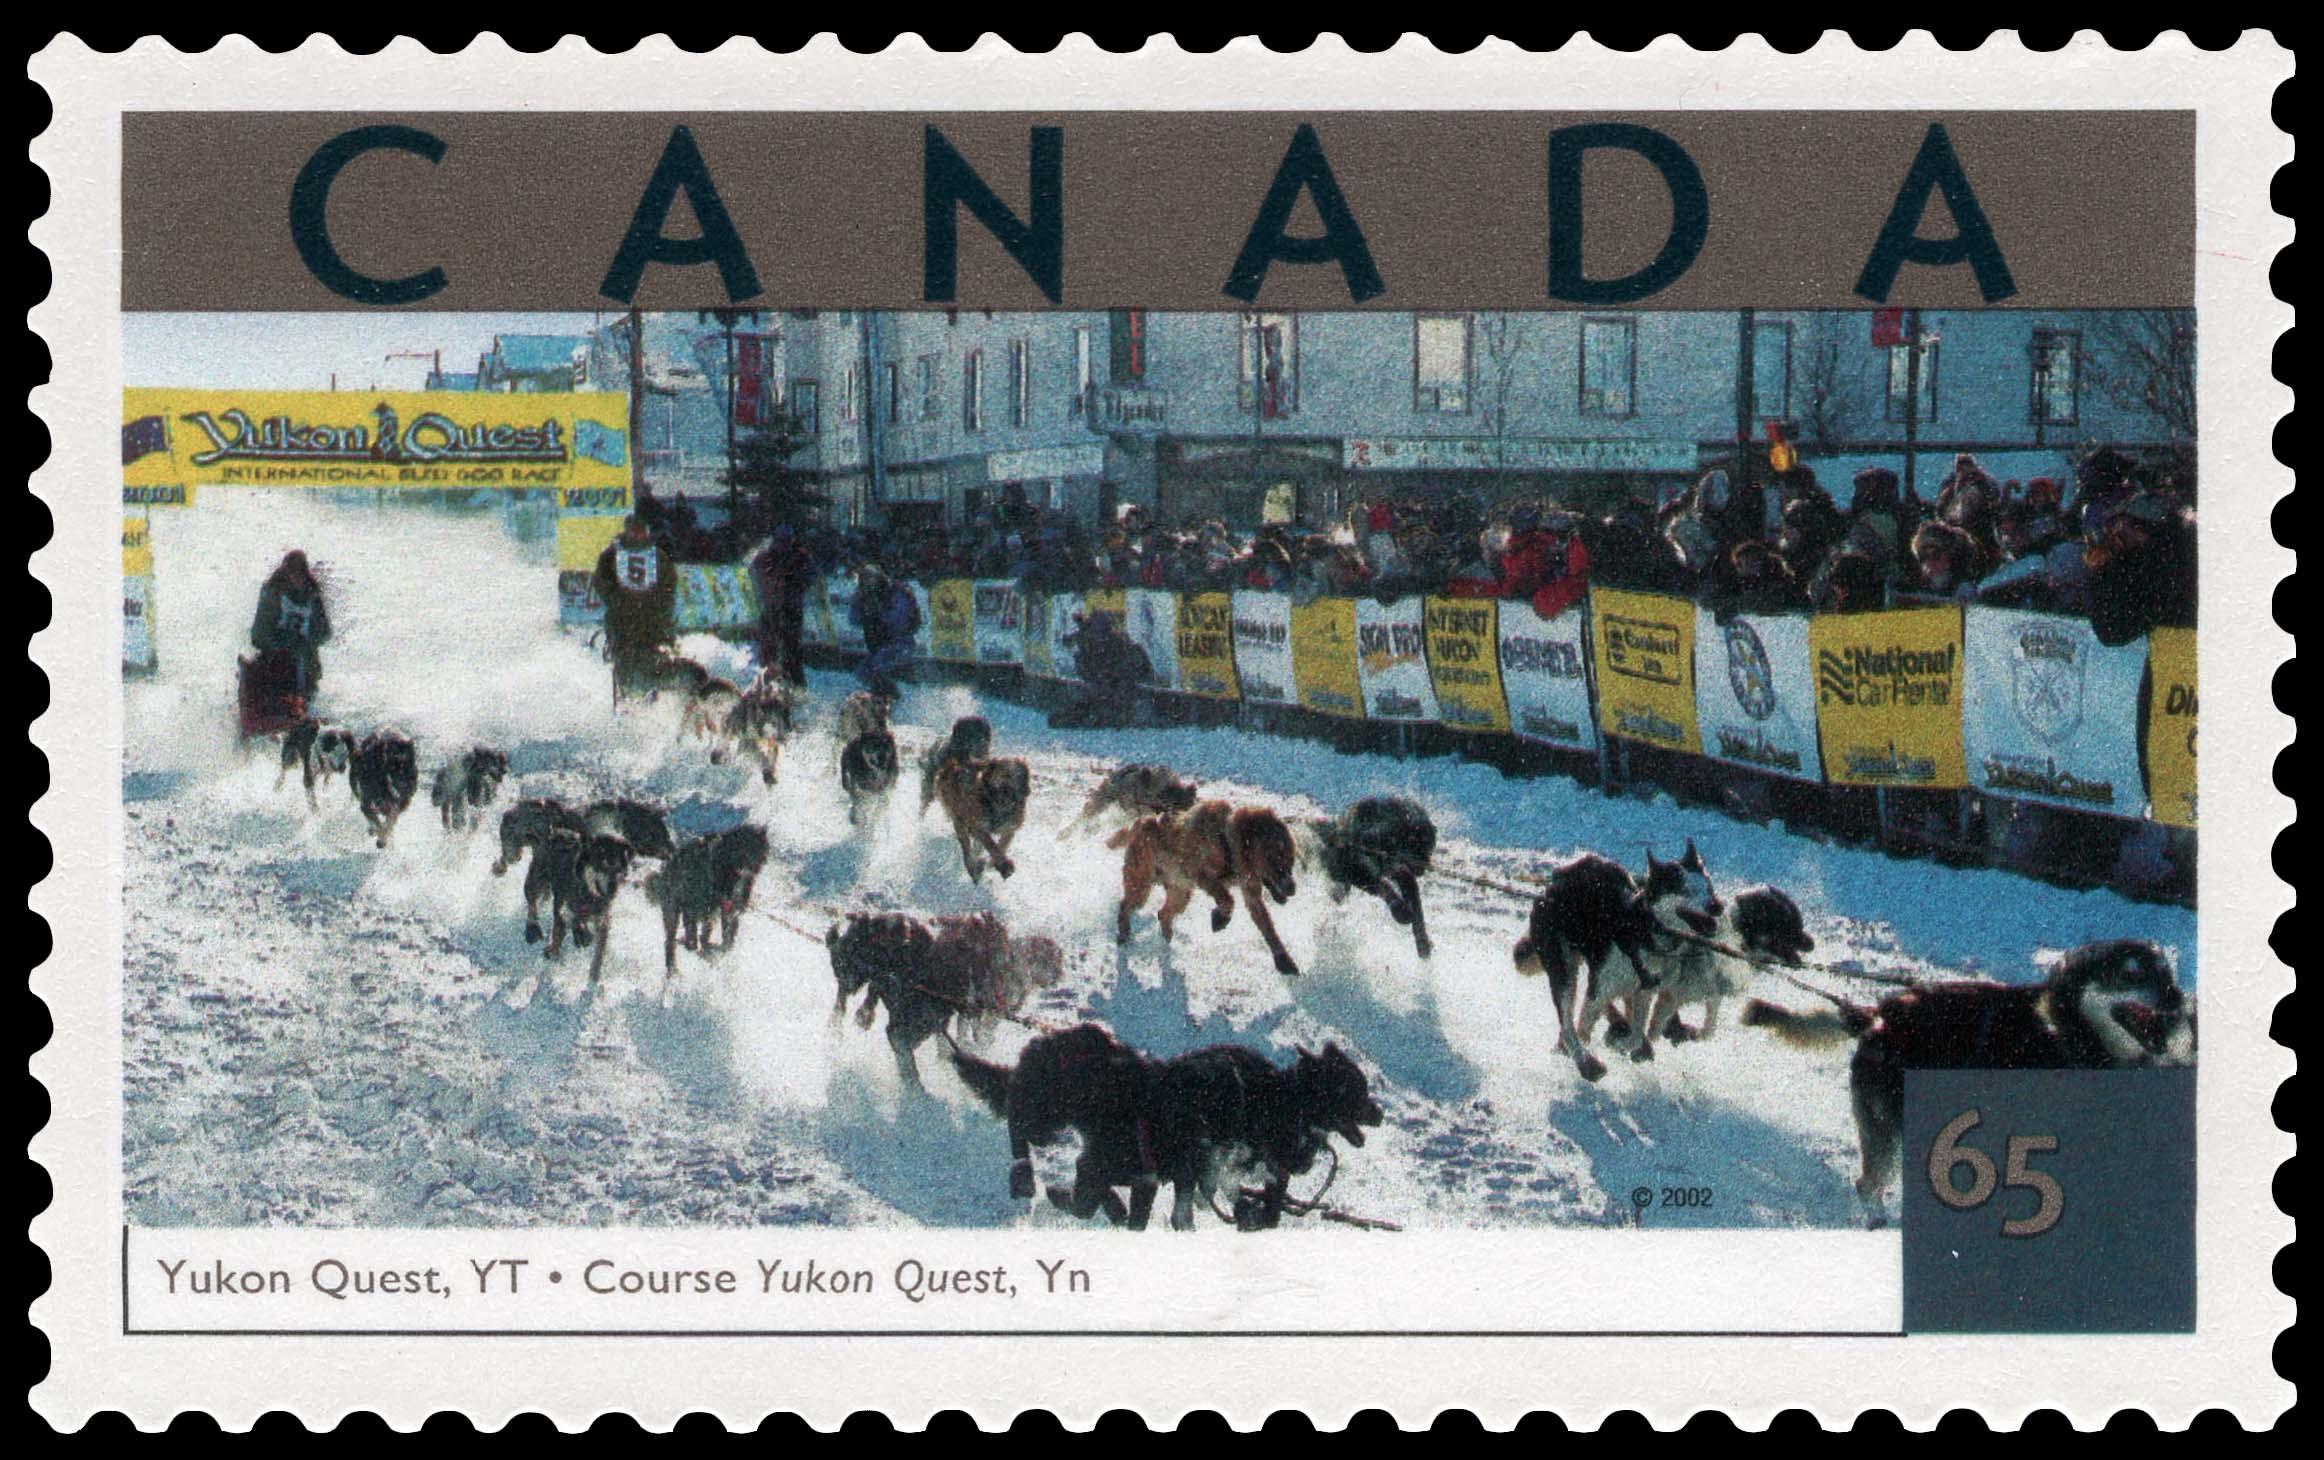 Yukon Quest, Yukon Canada Postage Stamp | Tourist Attractions